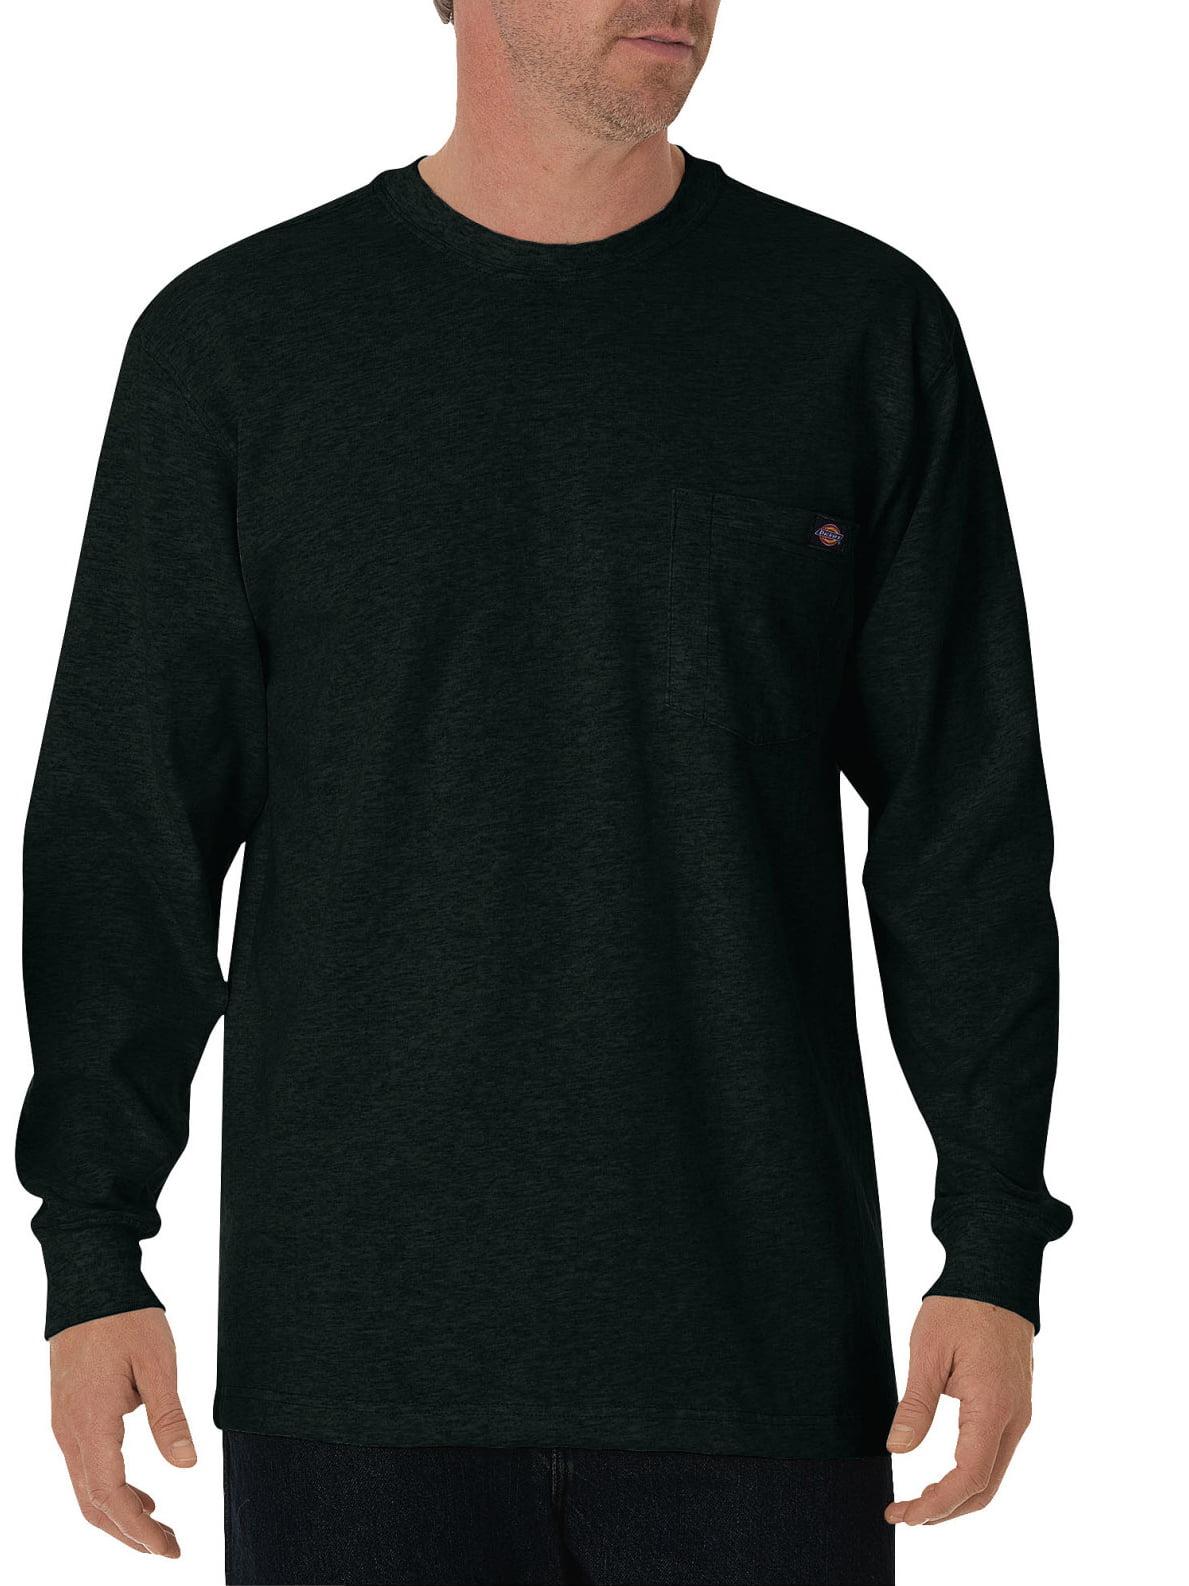 Star Trek Balance Of Terror Adult Crewneck Sweatshirt